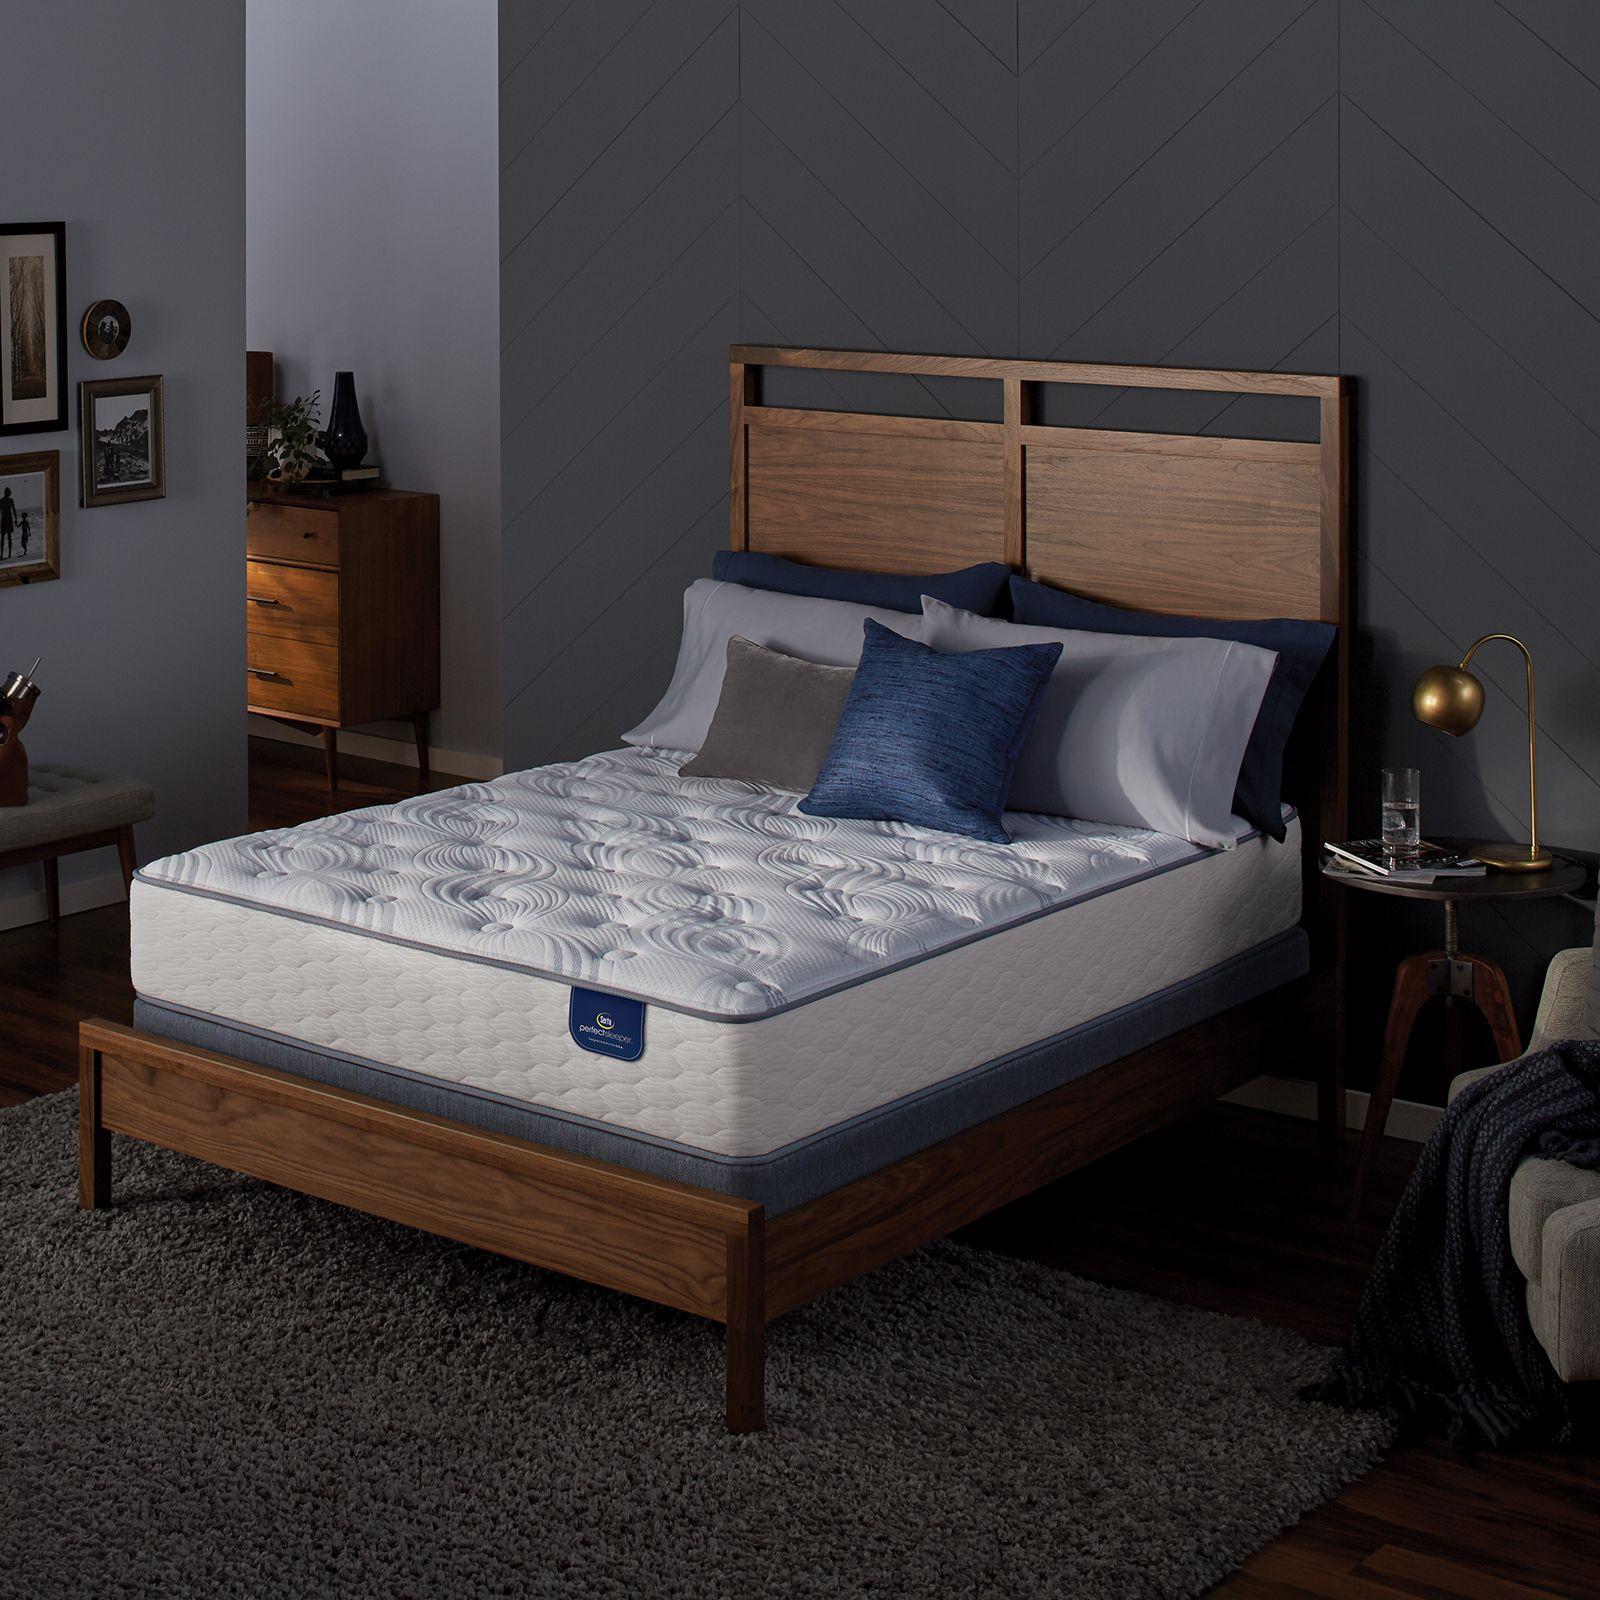 Serta Serta Perfect Sleeper Plumstead Plush Queen Mattress